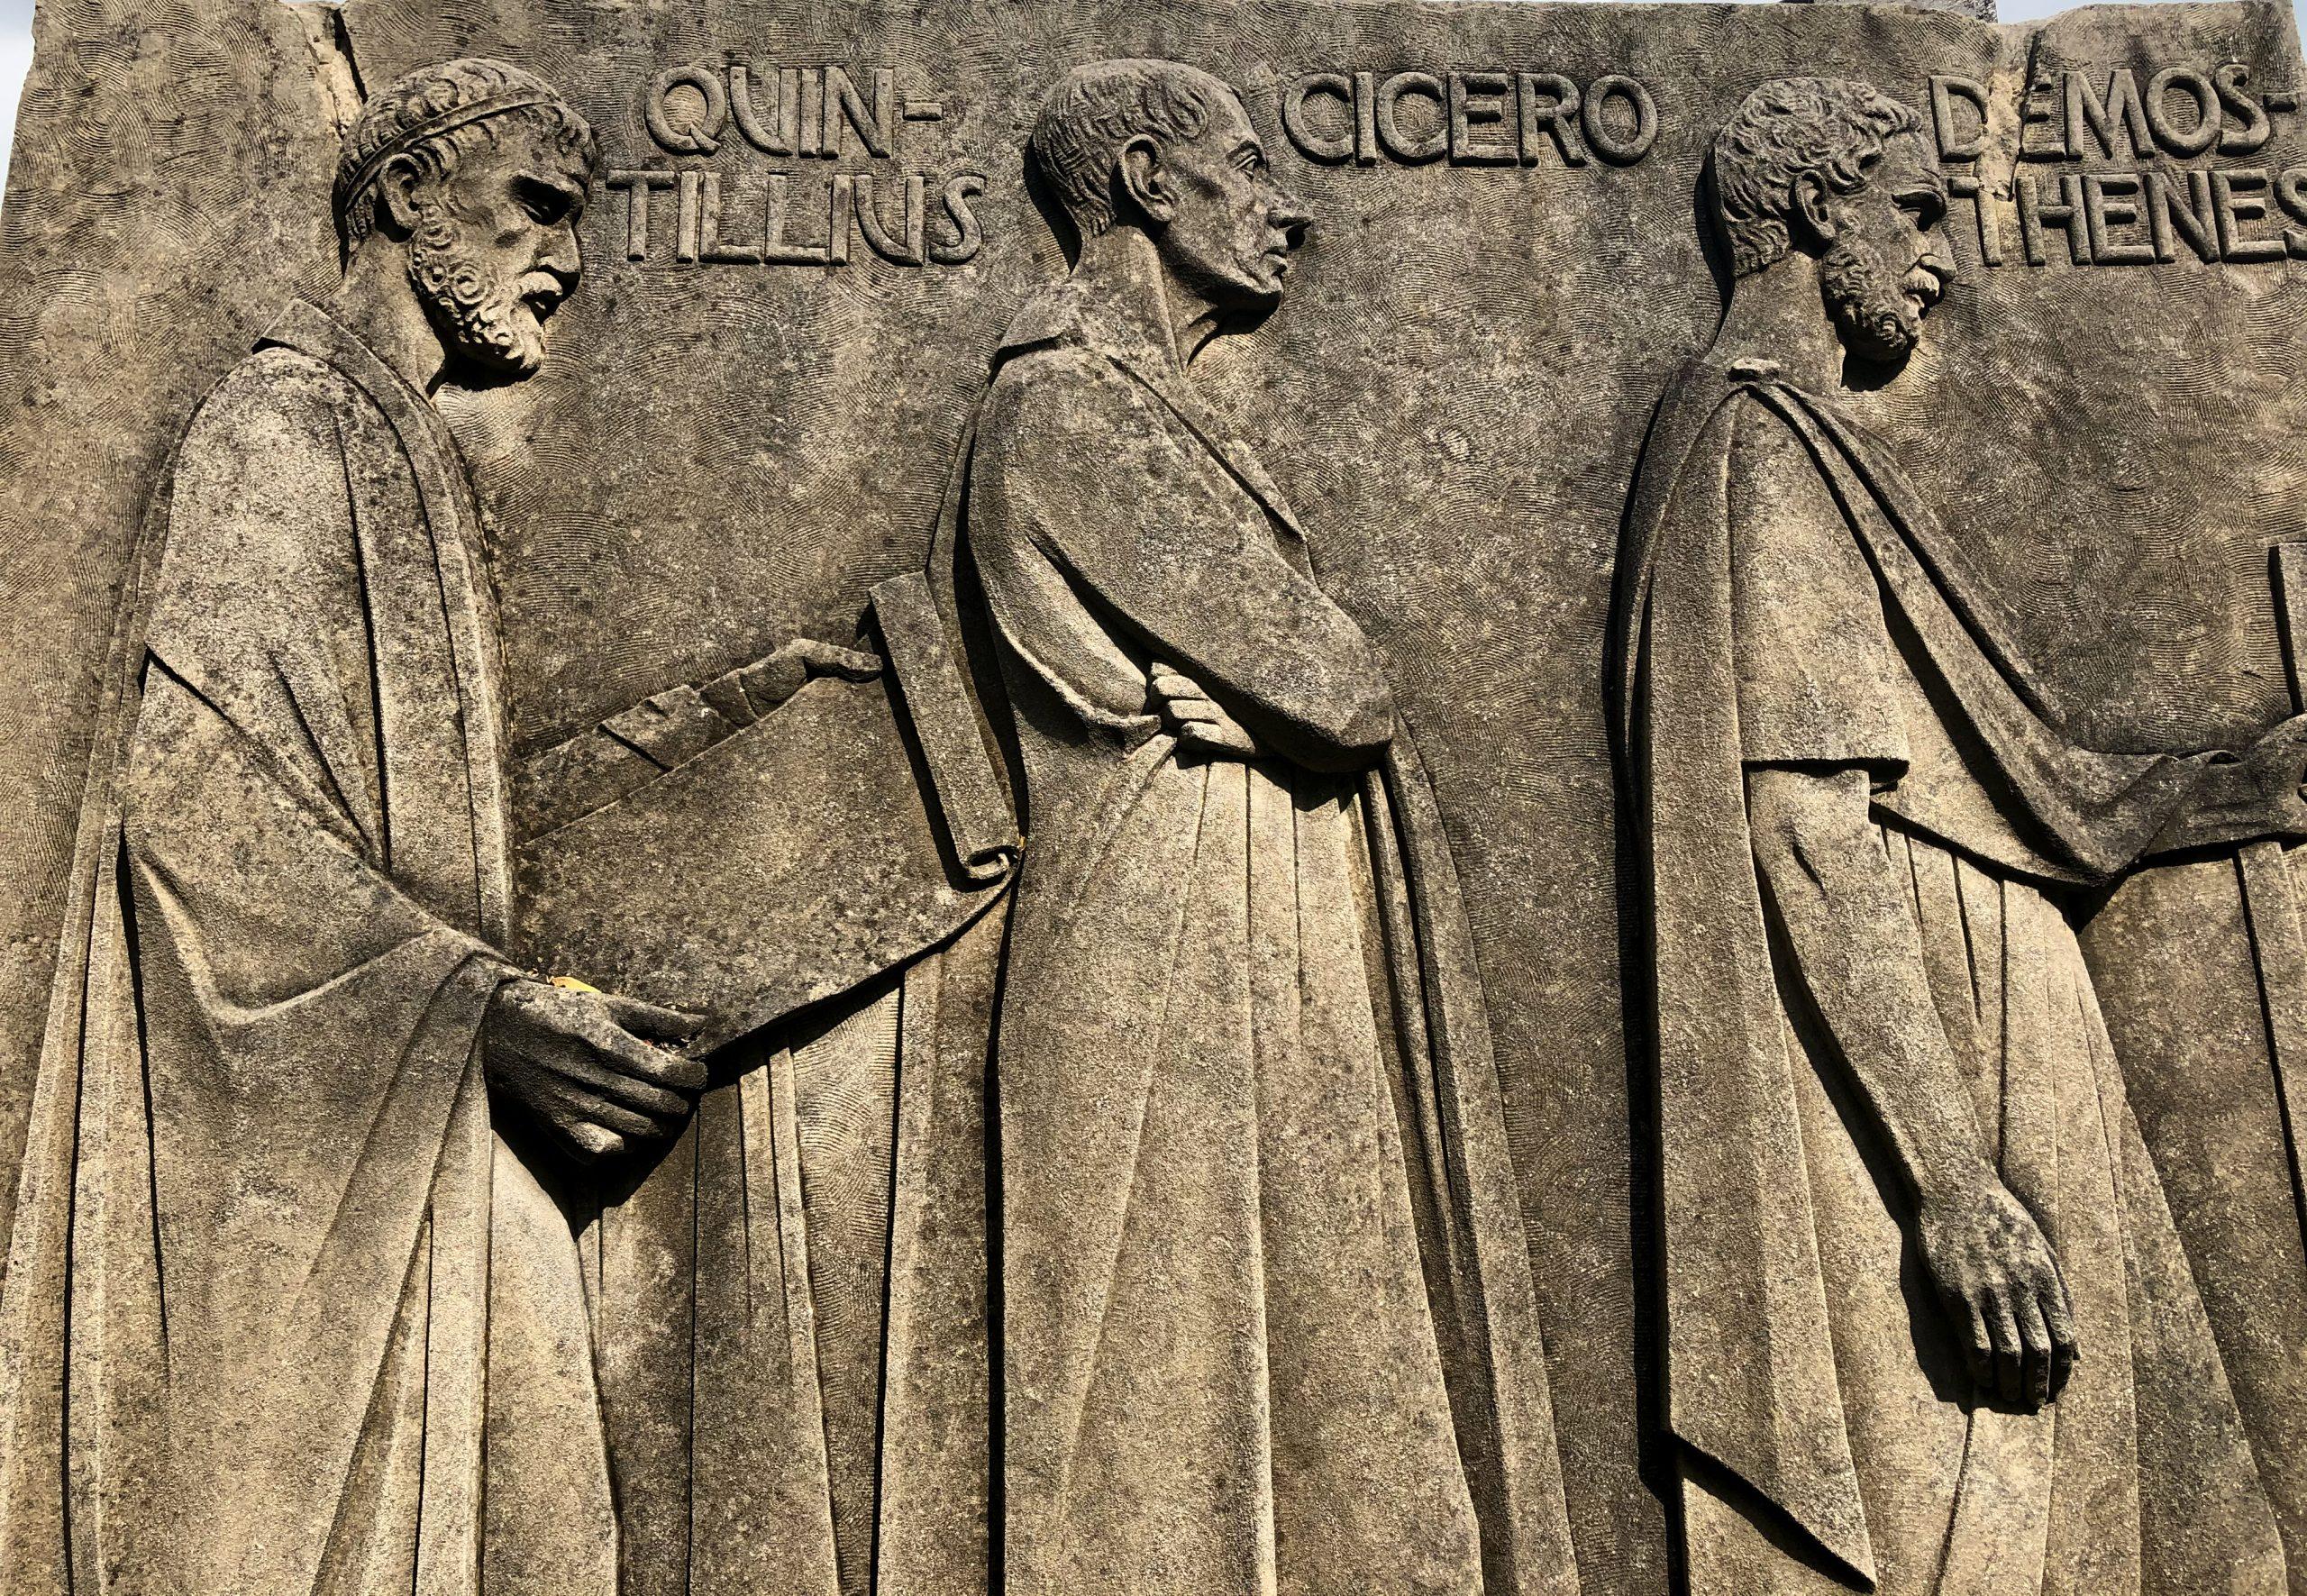 fishwick relief with quintillius, cicero and demosthenes